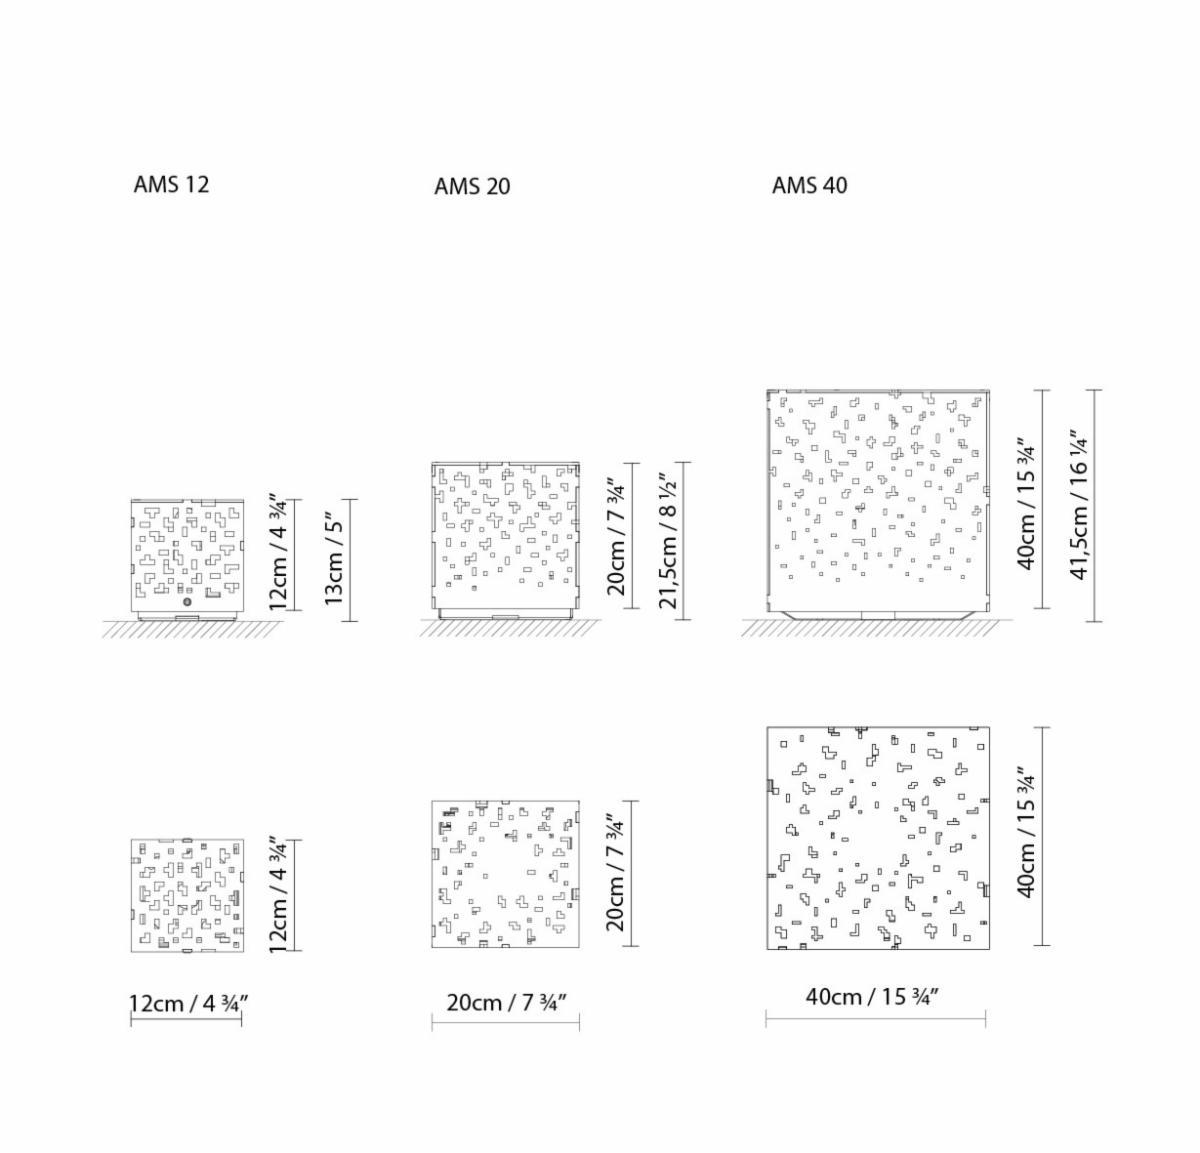 ams-drawing-blux-7122-01.jpg